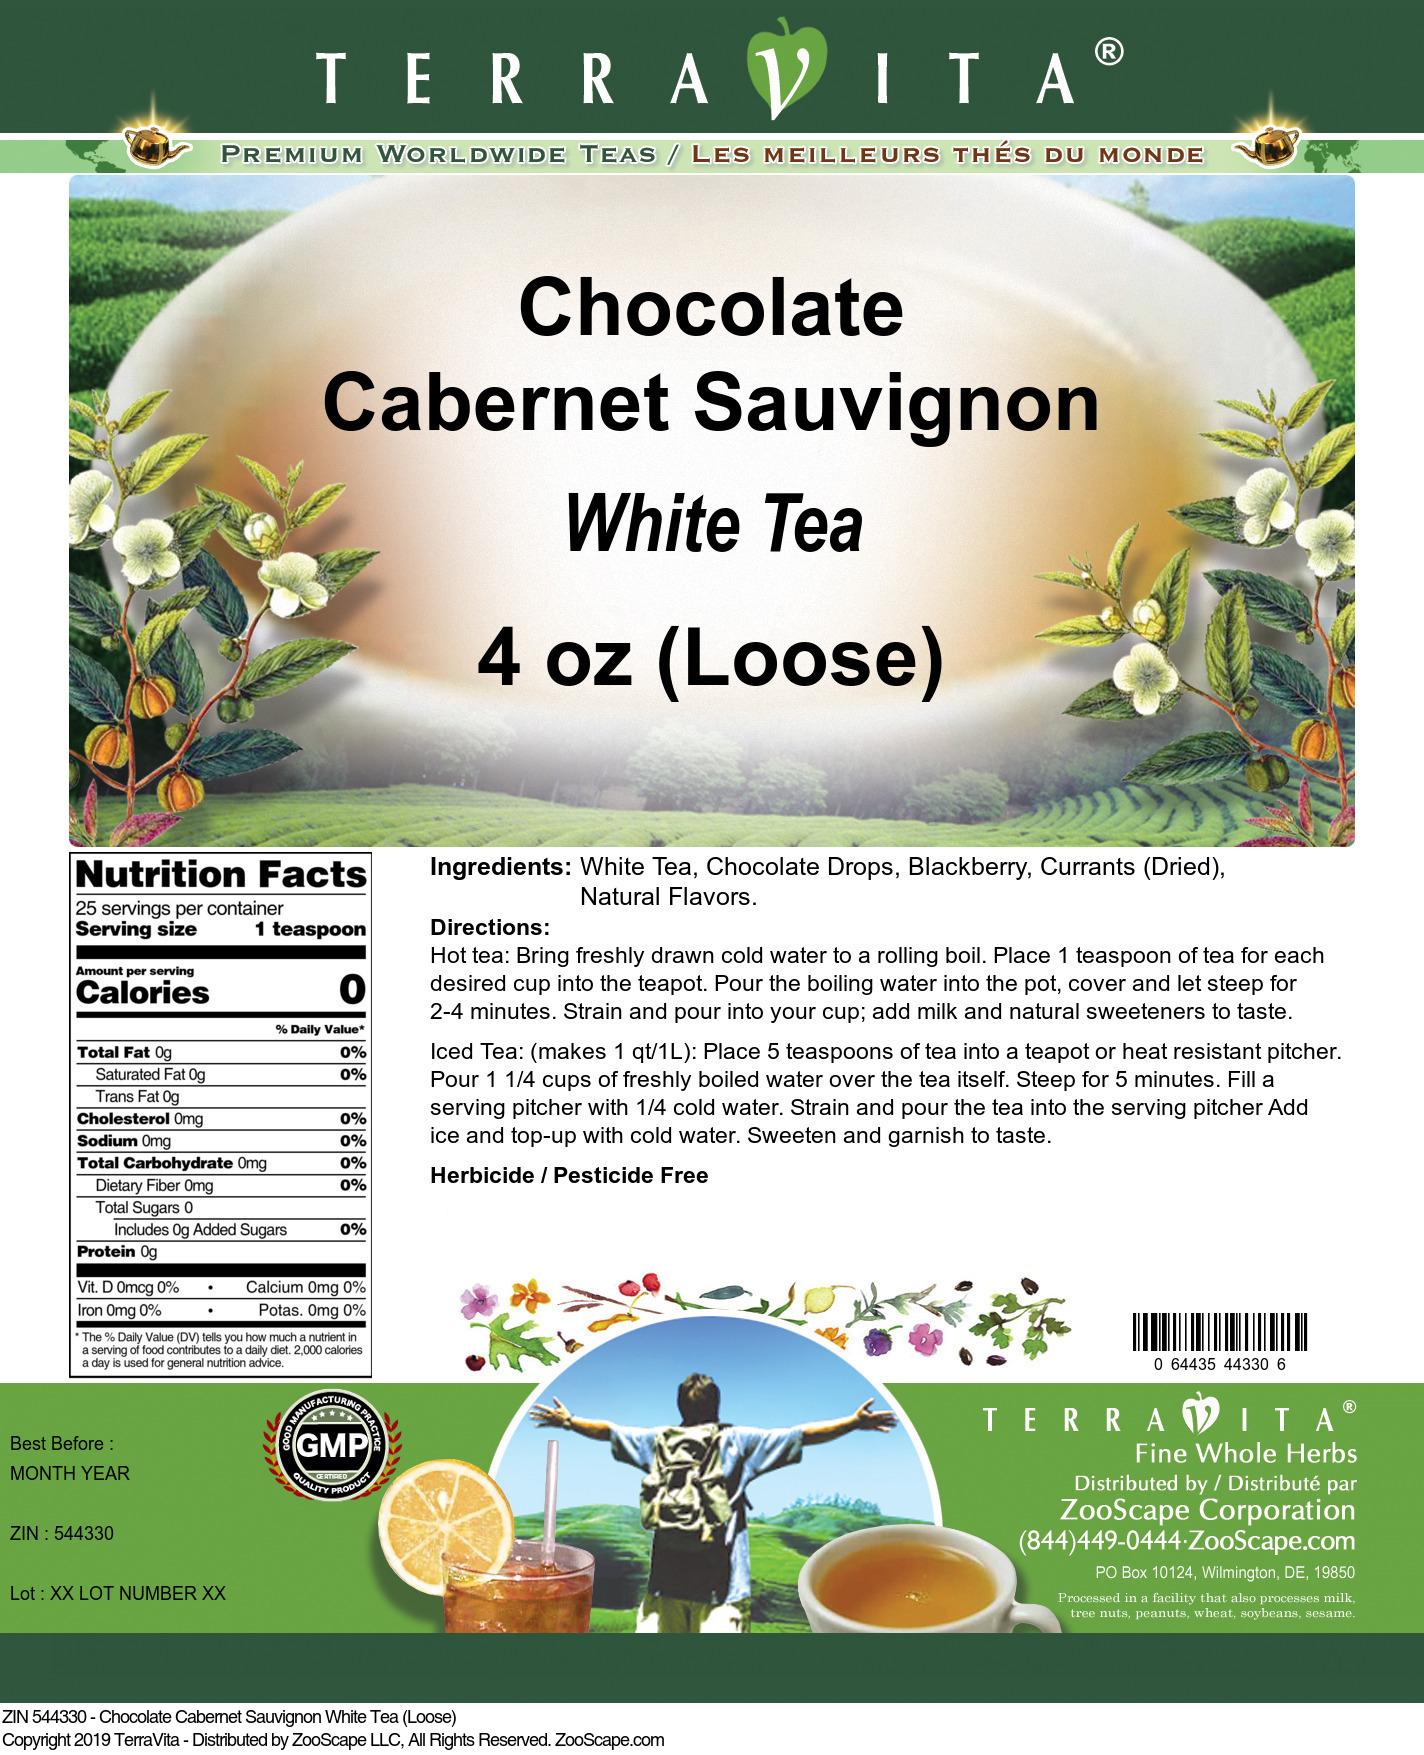 Chocolate Cabernet Sauvignon White Tea (Loose)